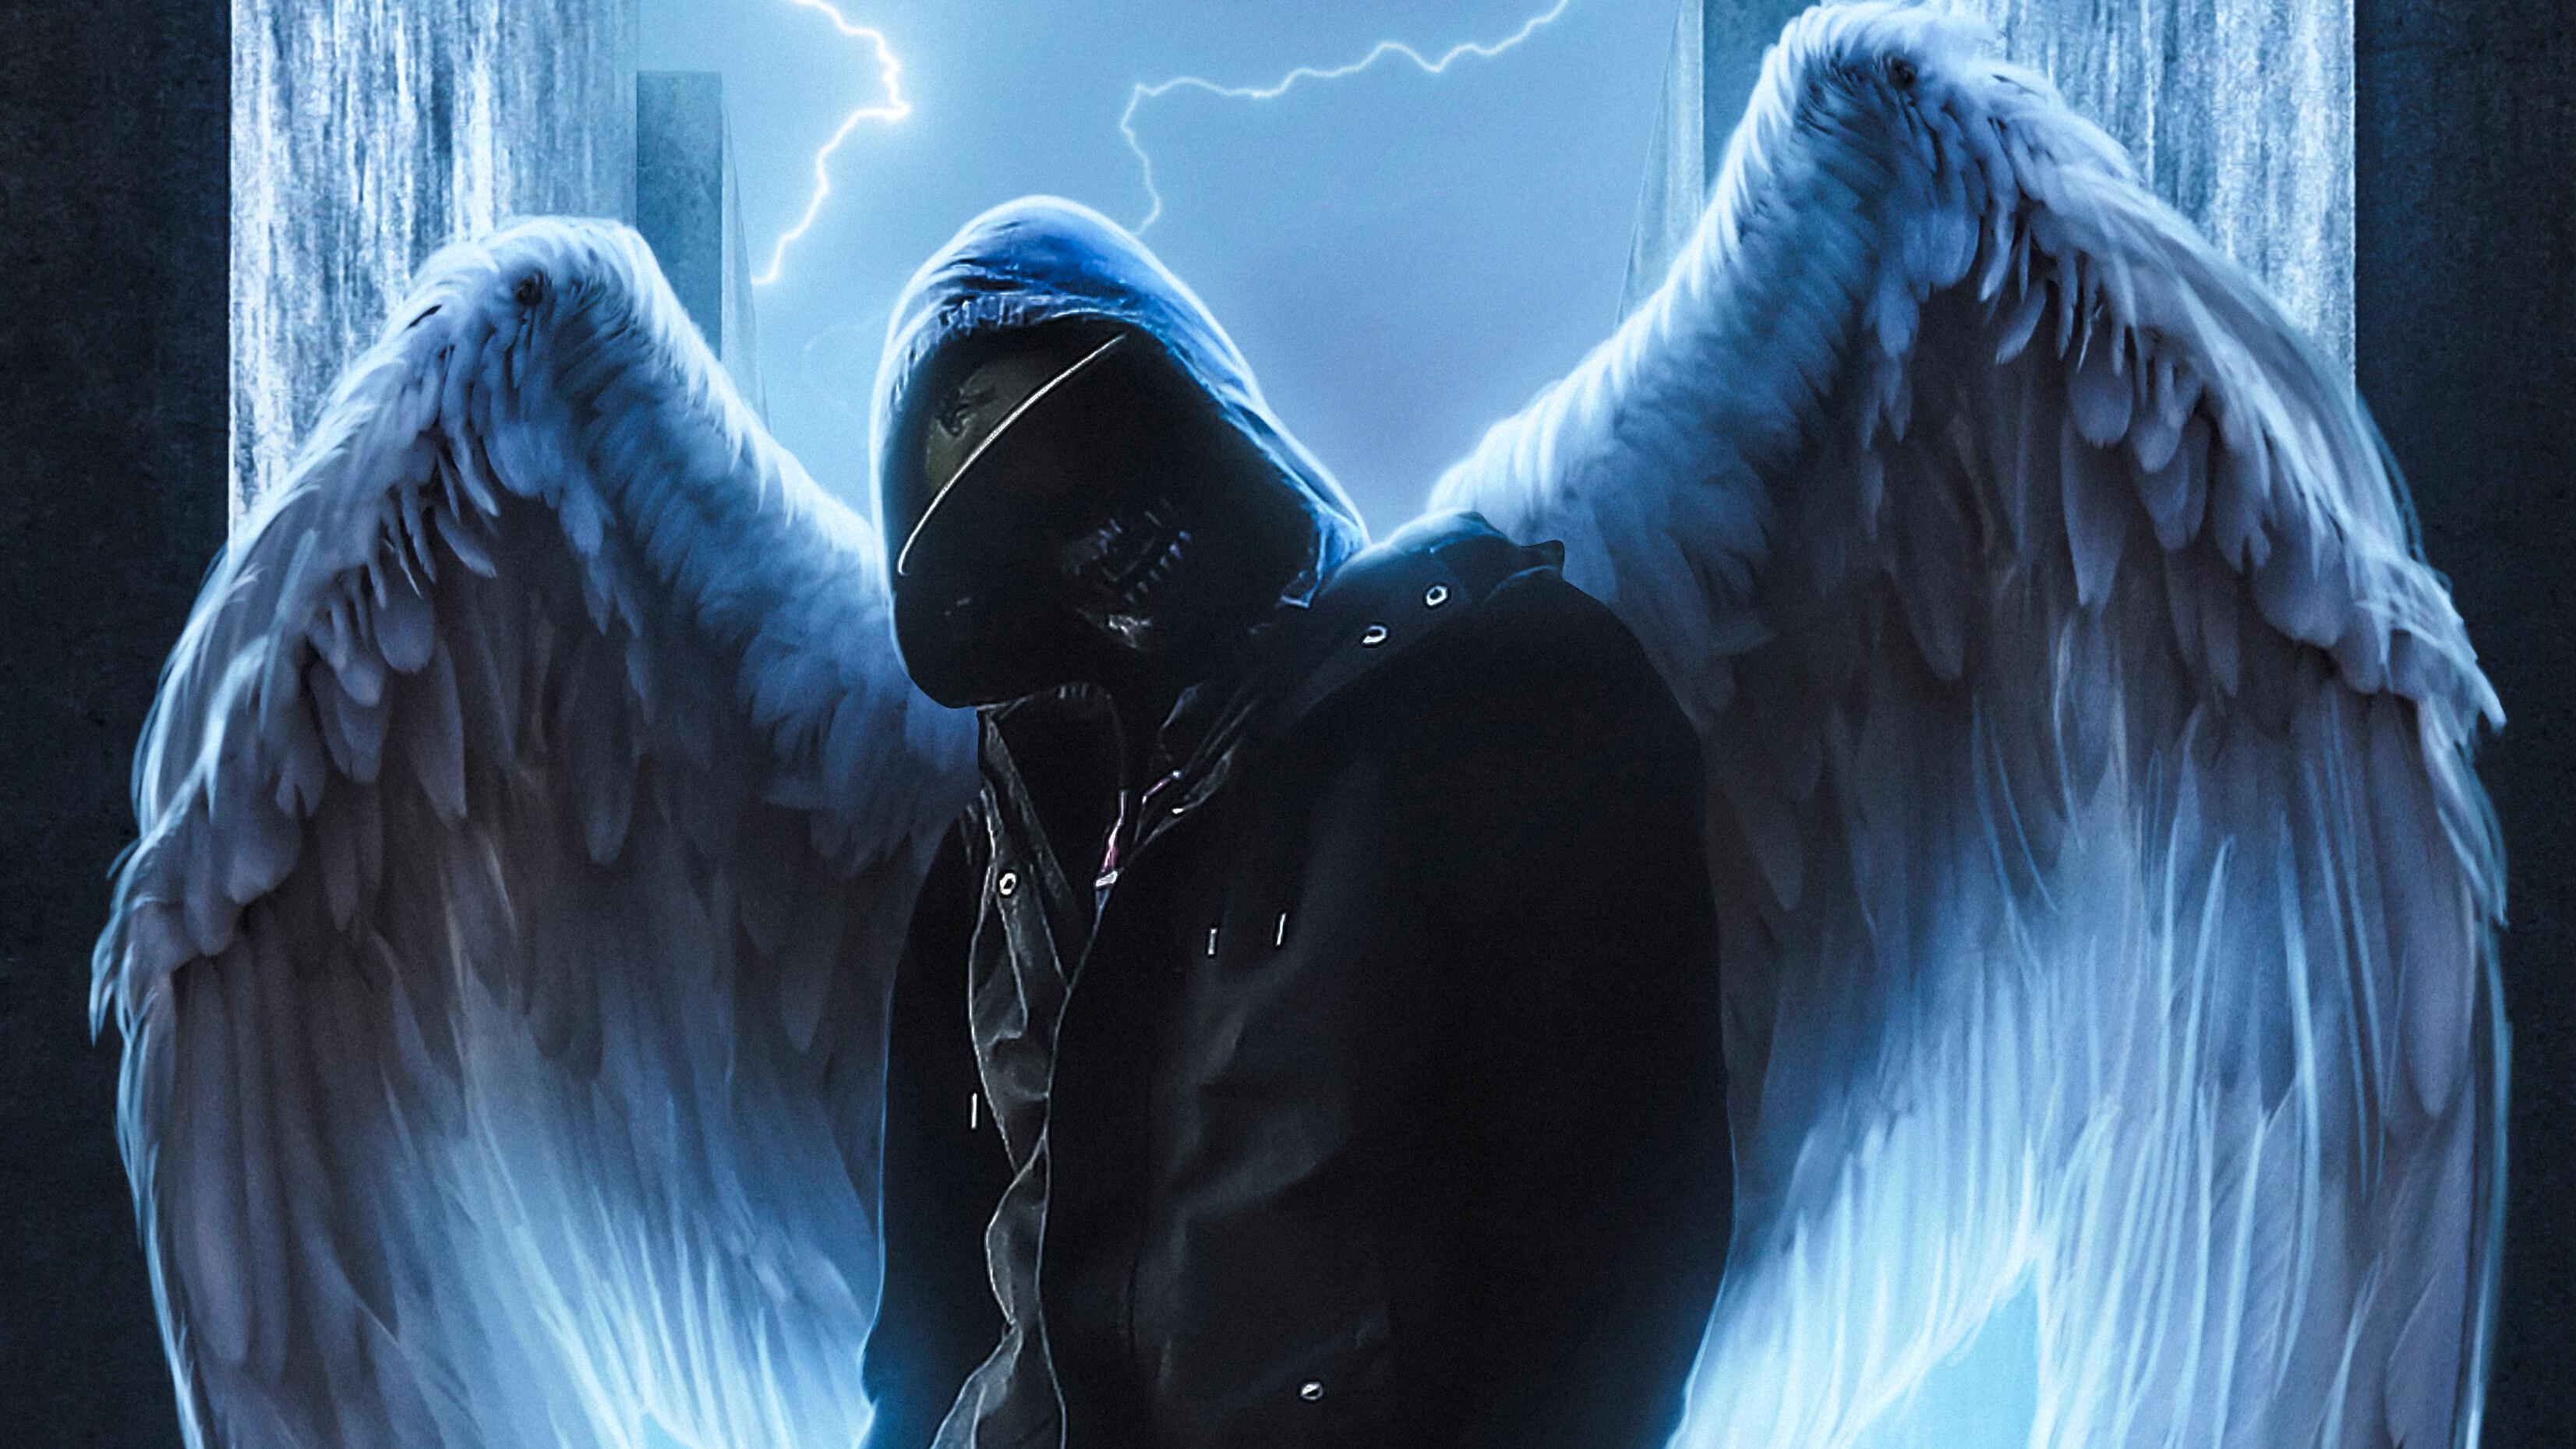 Hoodie Guy With Wings Hd Artist 4k Wallpapers Images